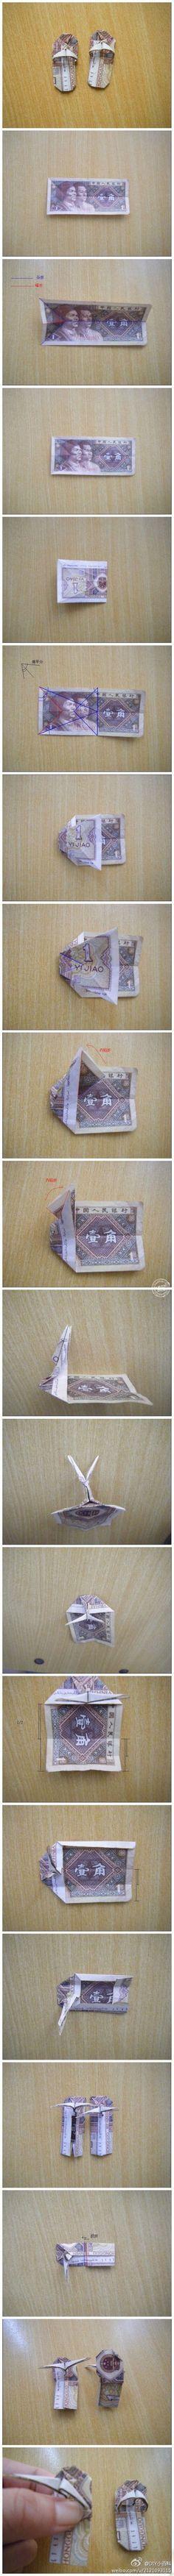 money flipflops